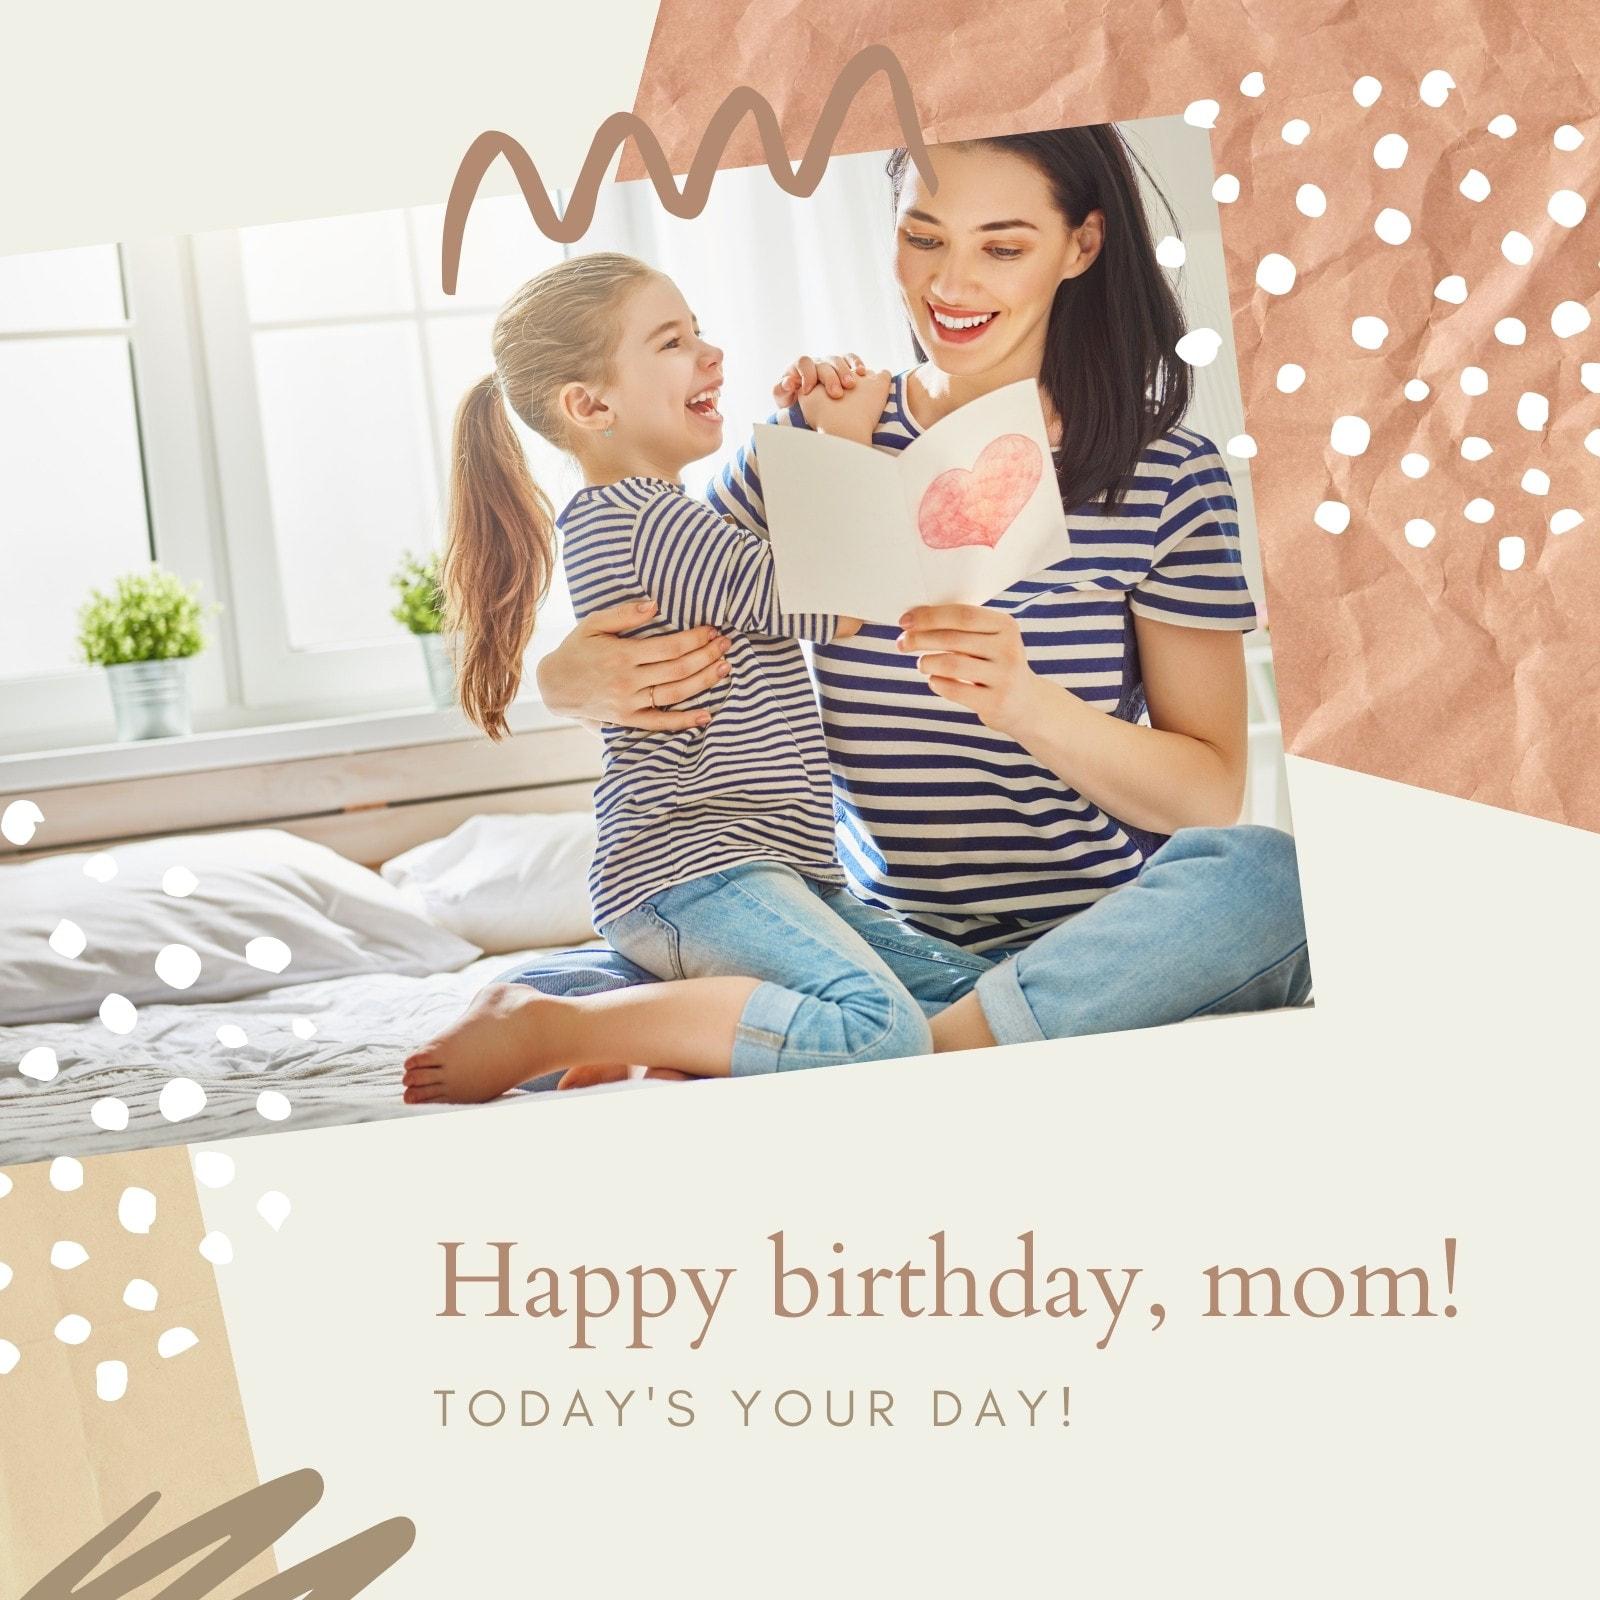 Mom's Birthday Facebook Video